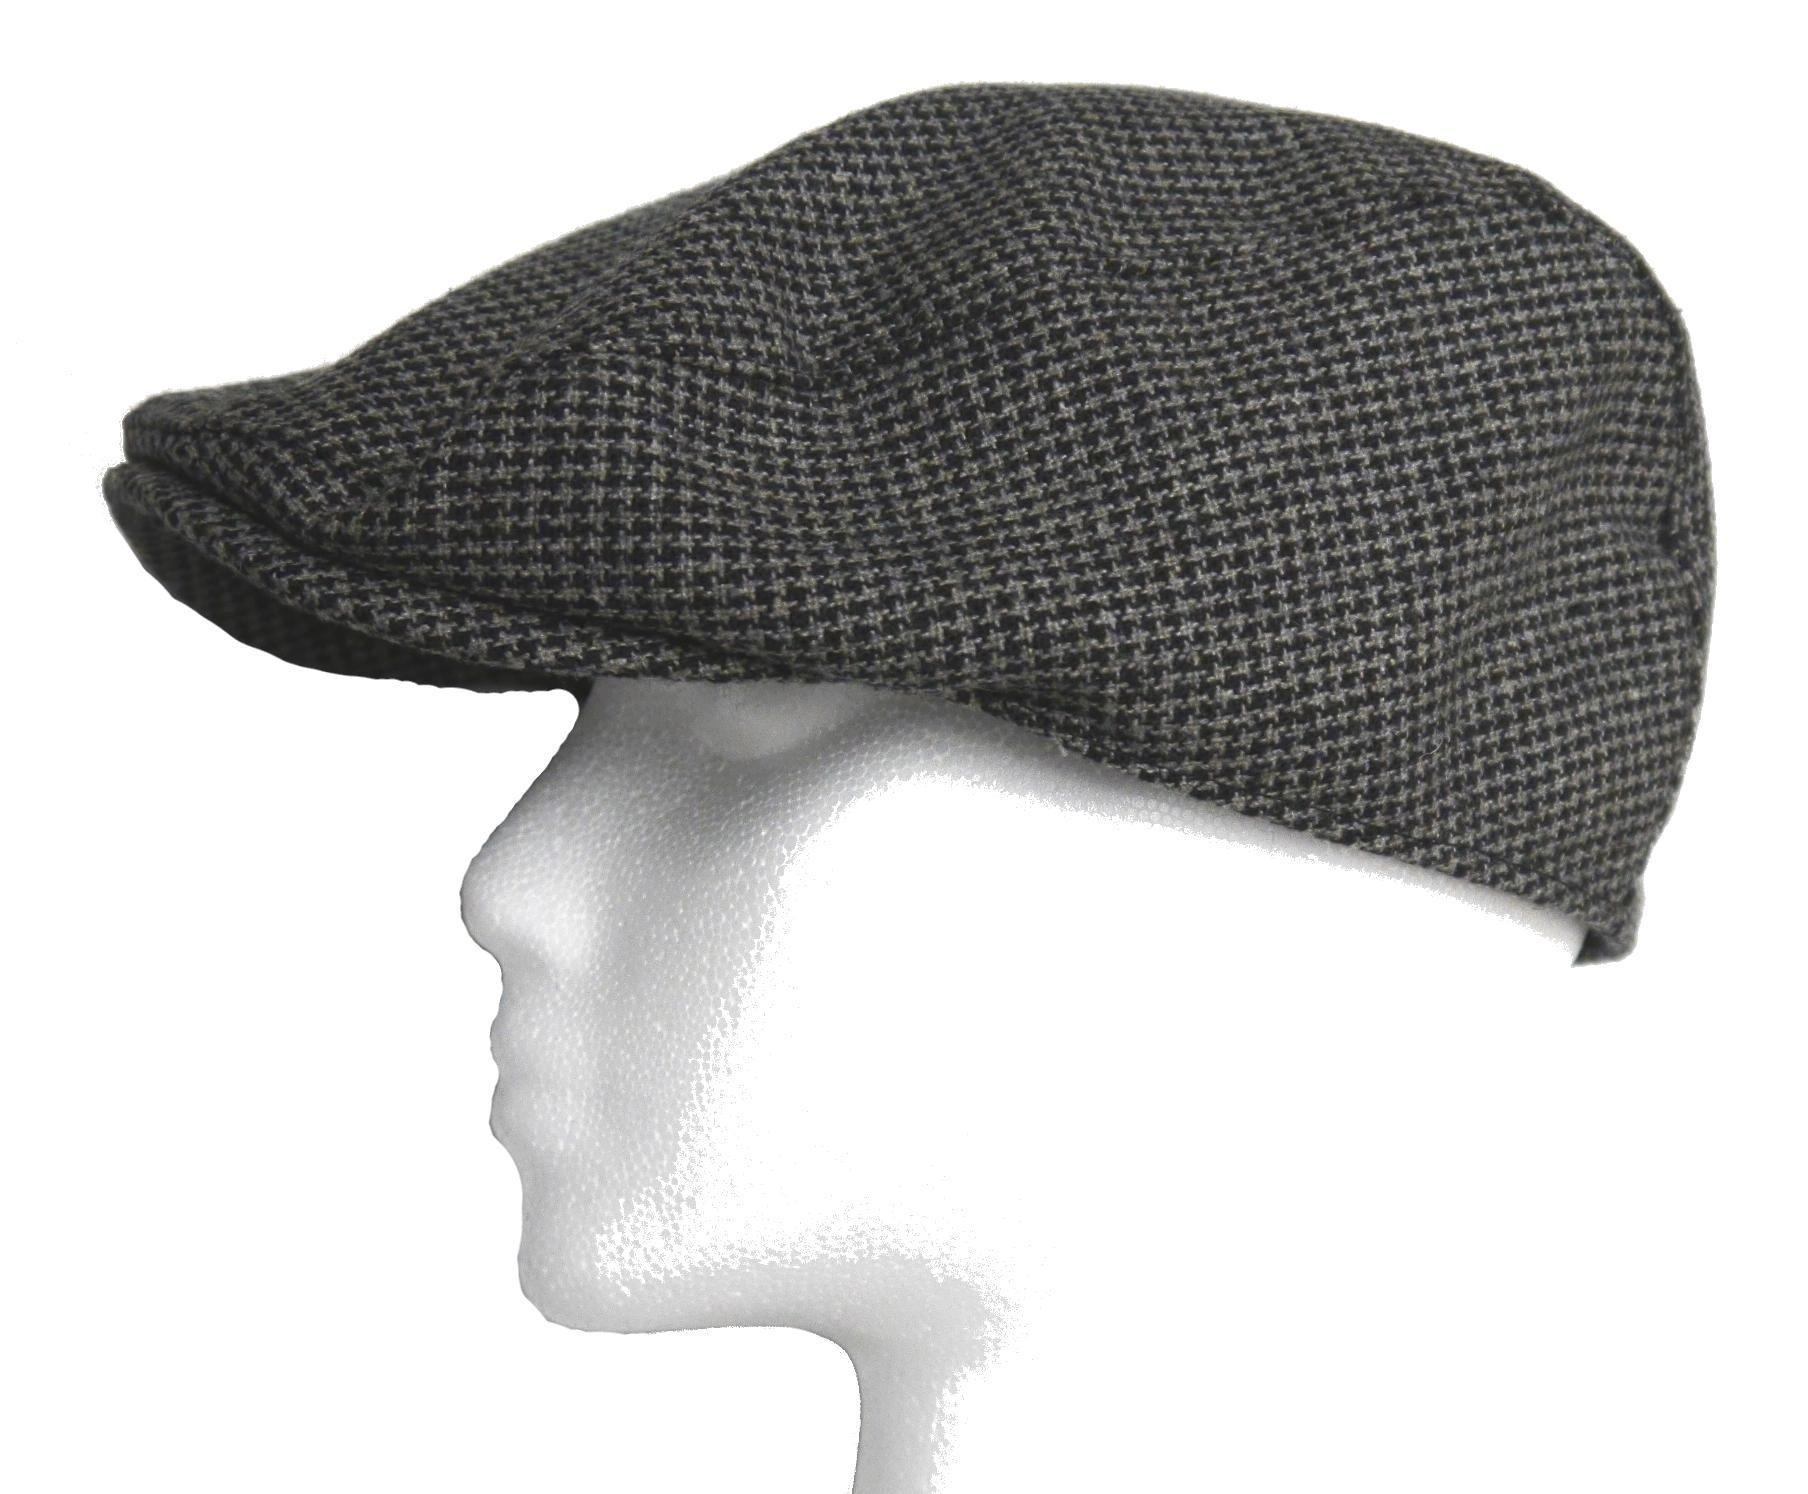 c0ea5b0e Newsboy Blend Cap Paperboy Men Boy Gatsby Hipster Ivy Hat, Patterned ...